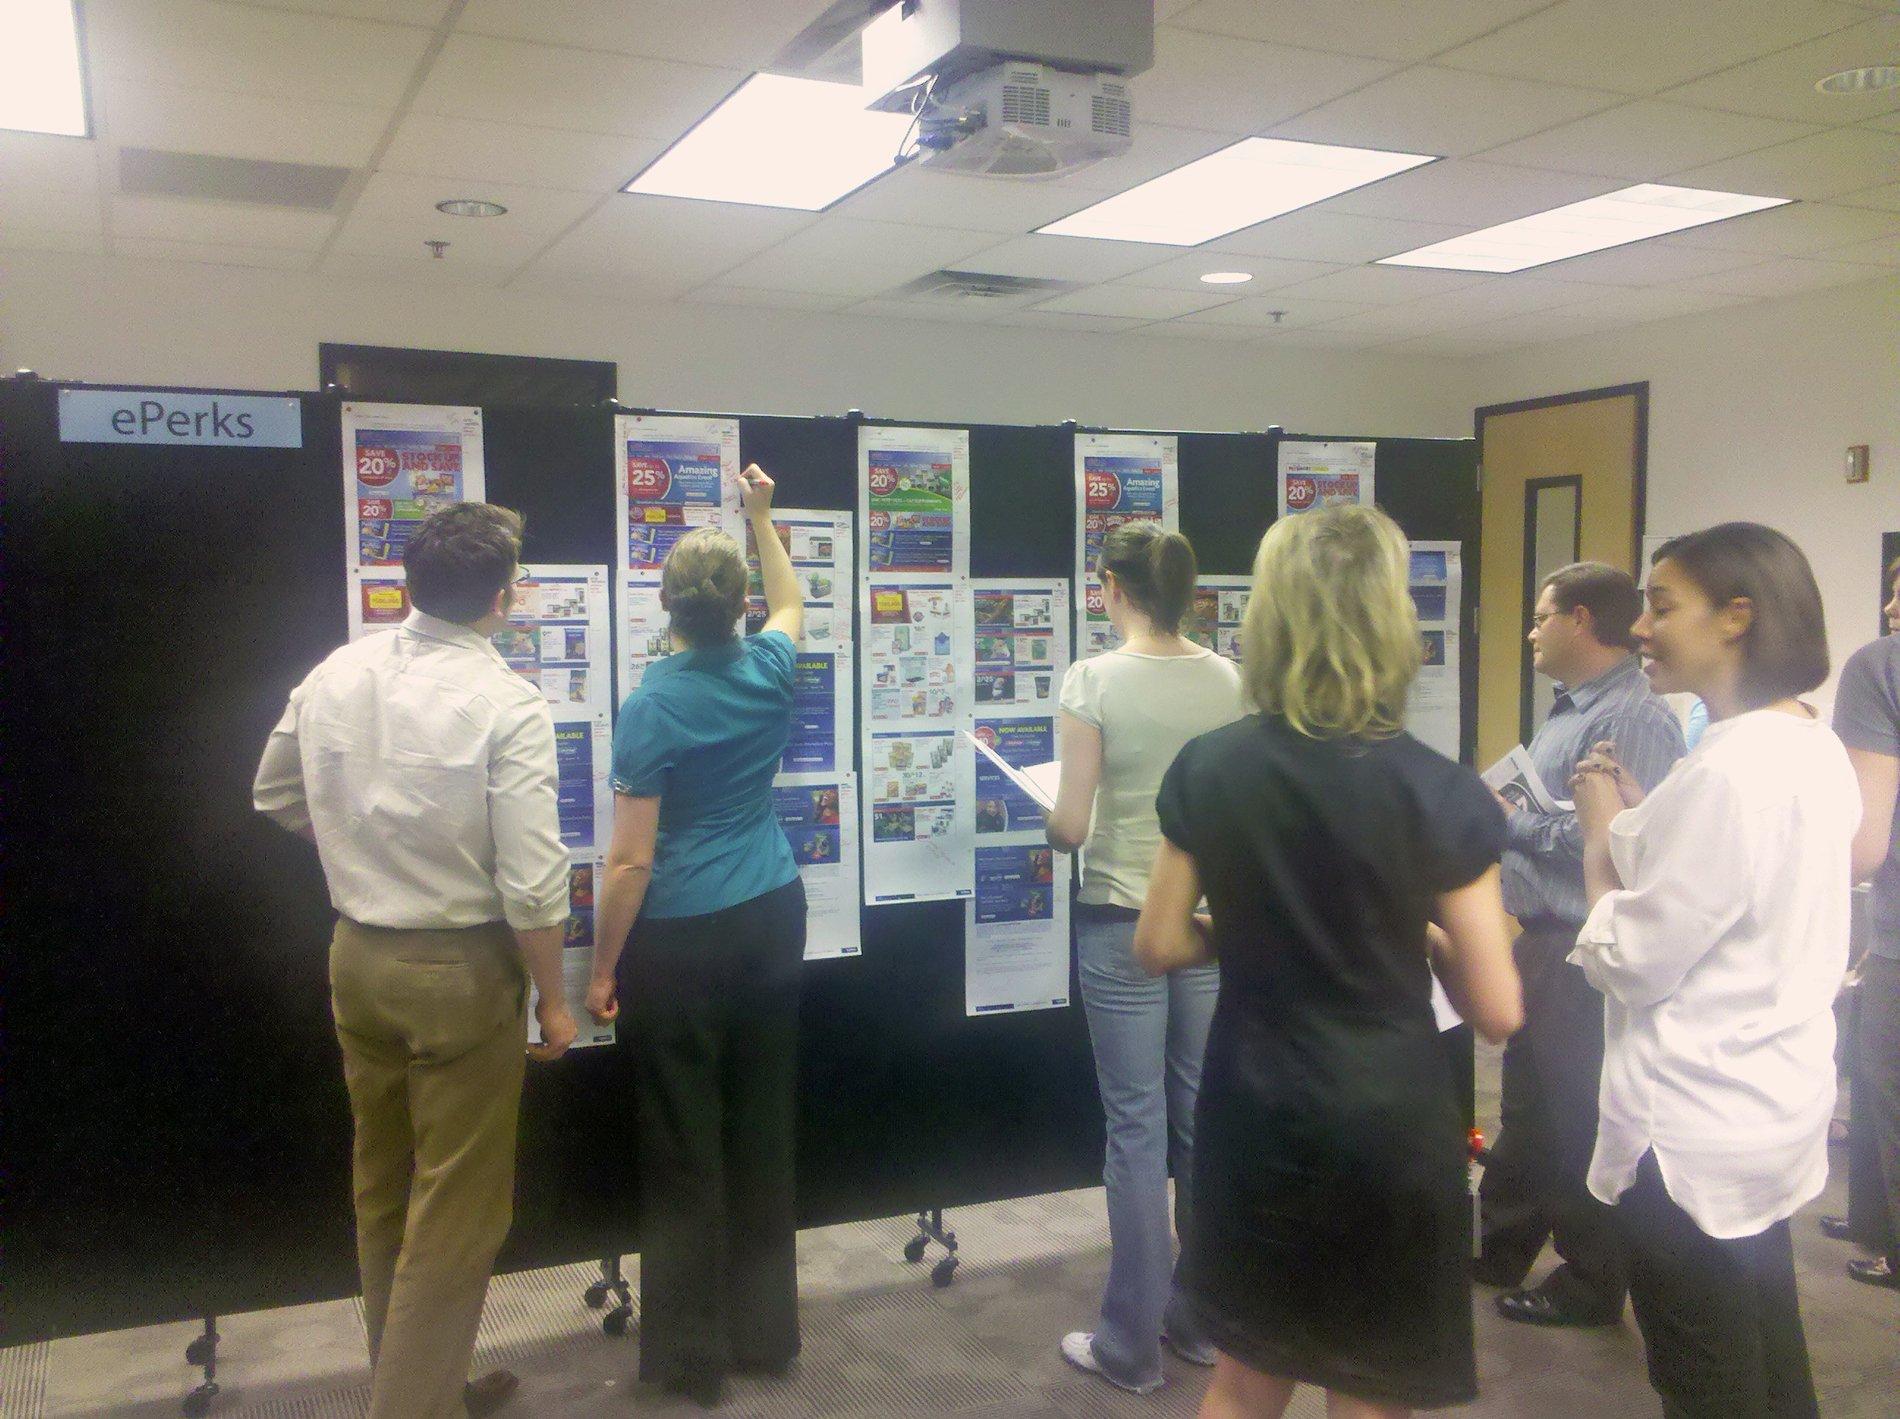 Room Dividers at Petsmart meeting